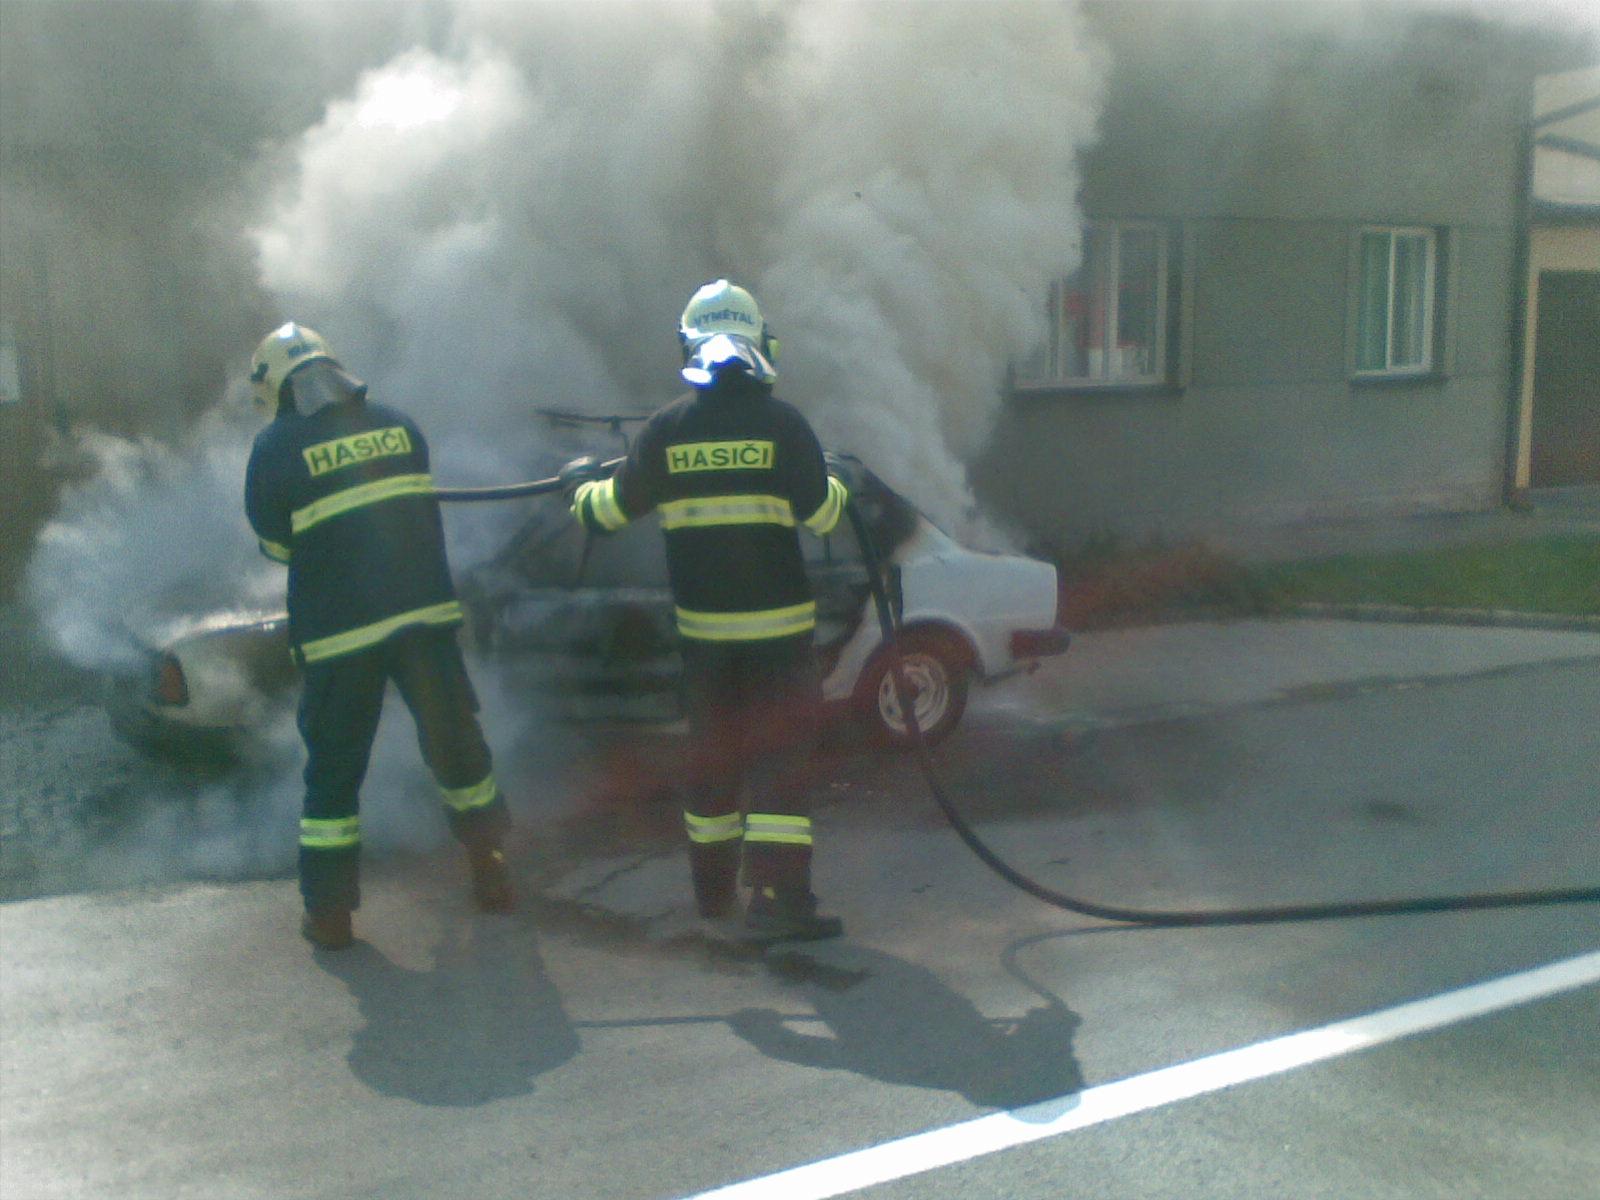 2009-09-01-požár auta Týnecká Grygov-02